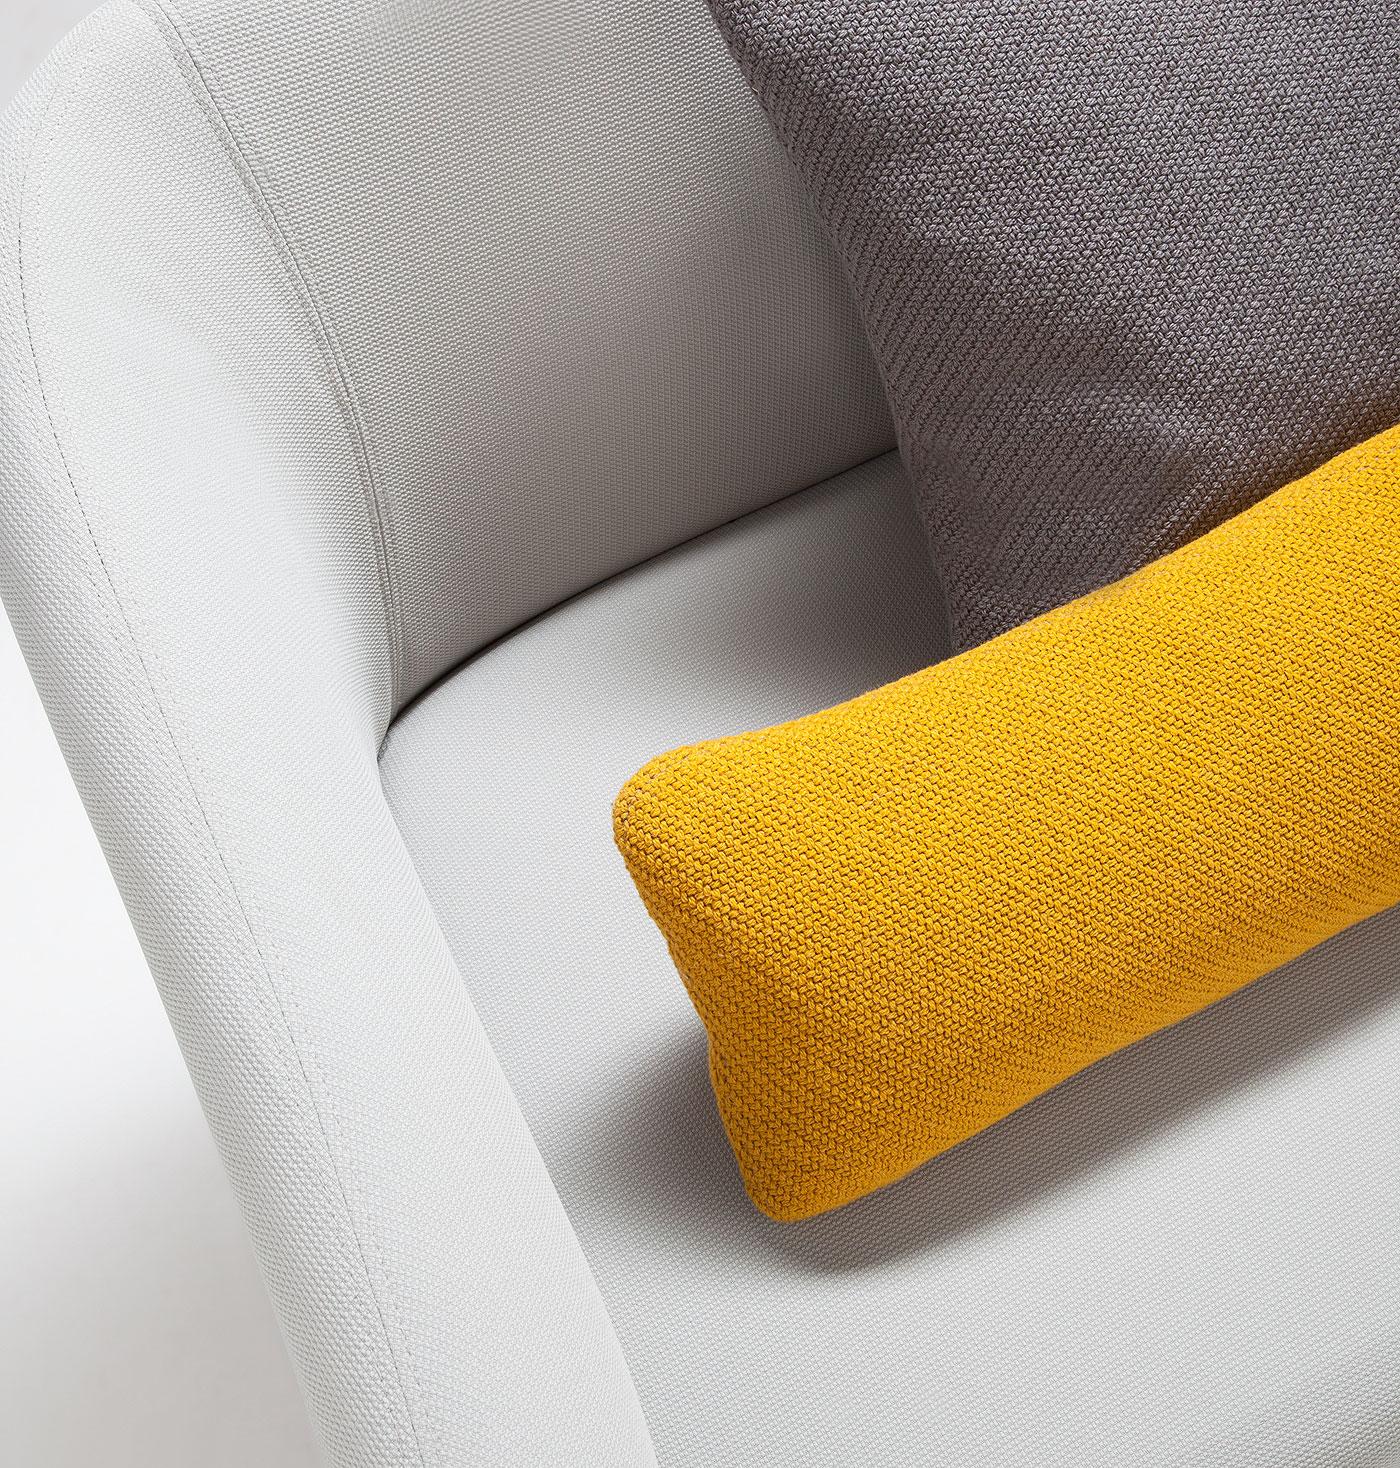 sofa-yon-pau-design-lavernia-cienfuegos (7)